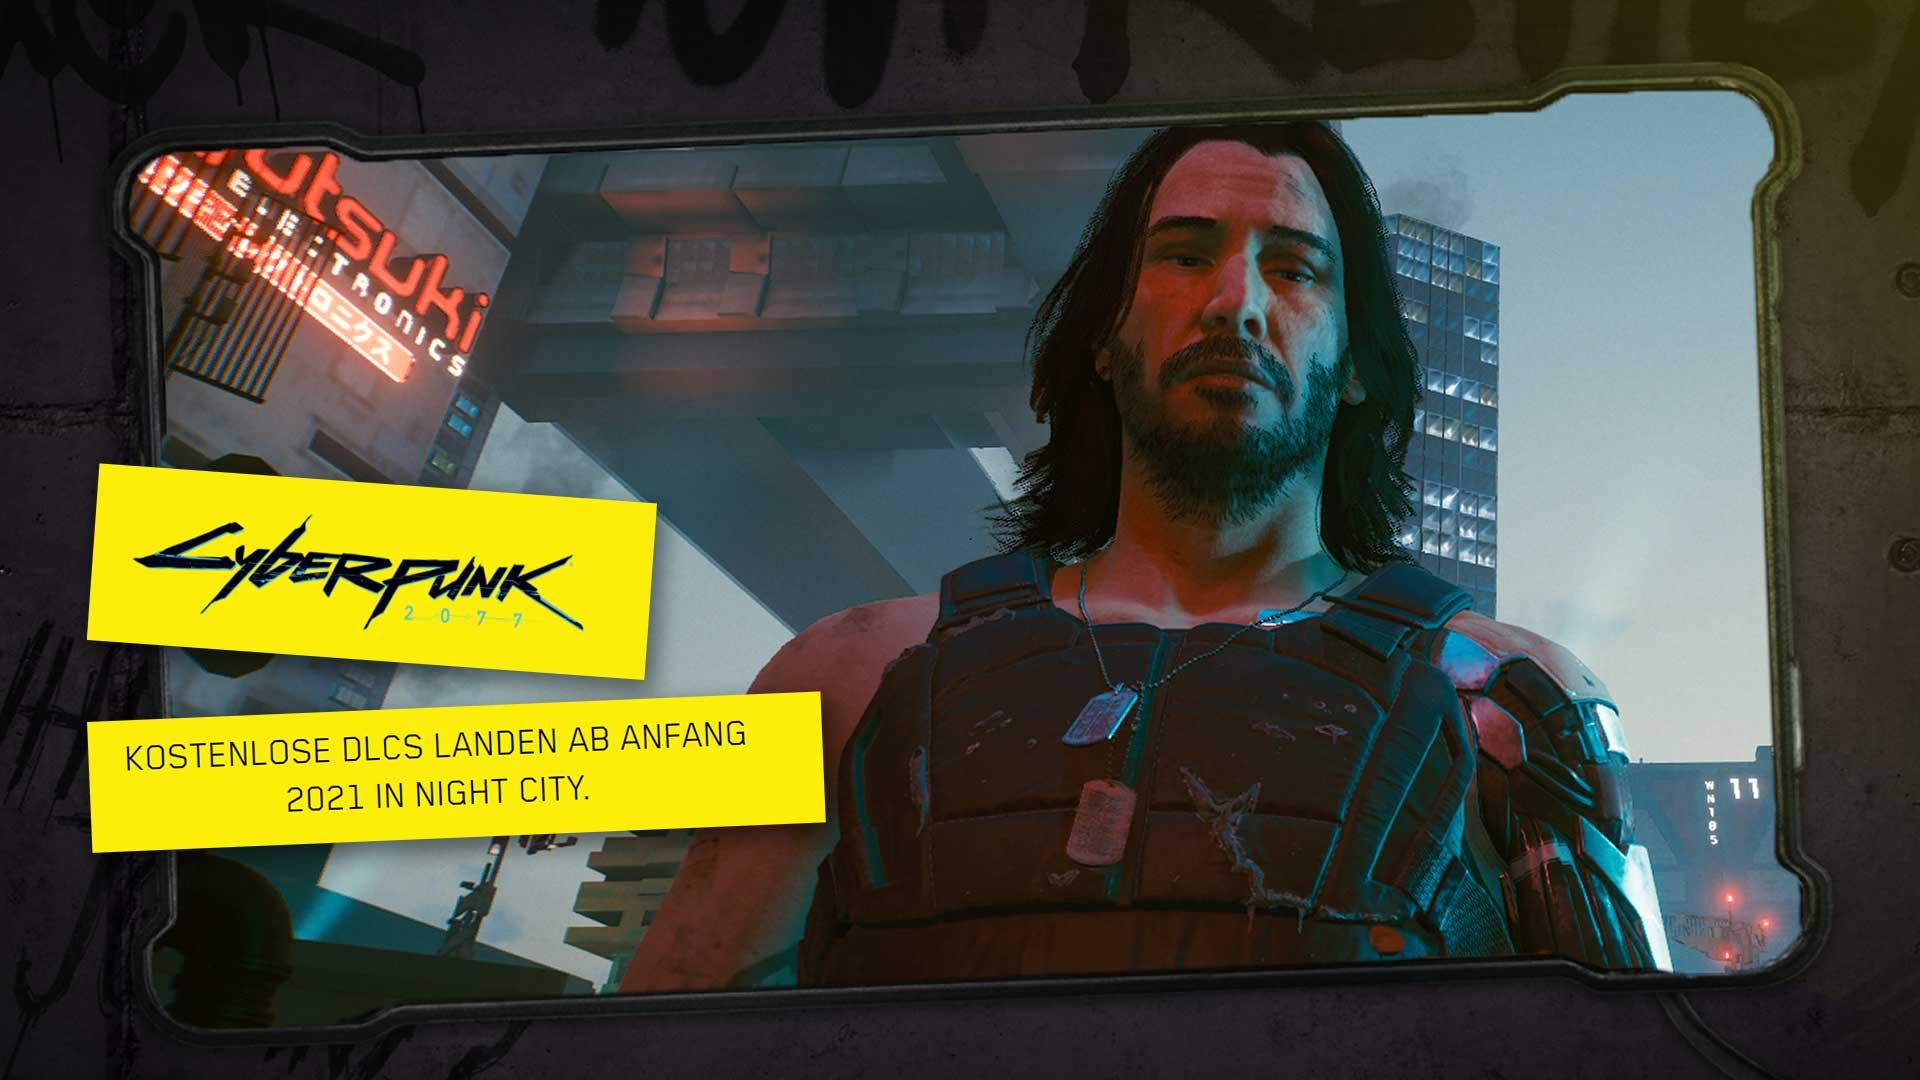 cyberpunk 2077 new dlc